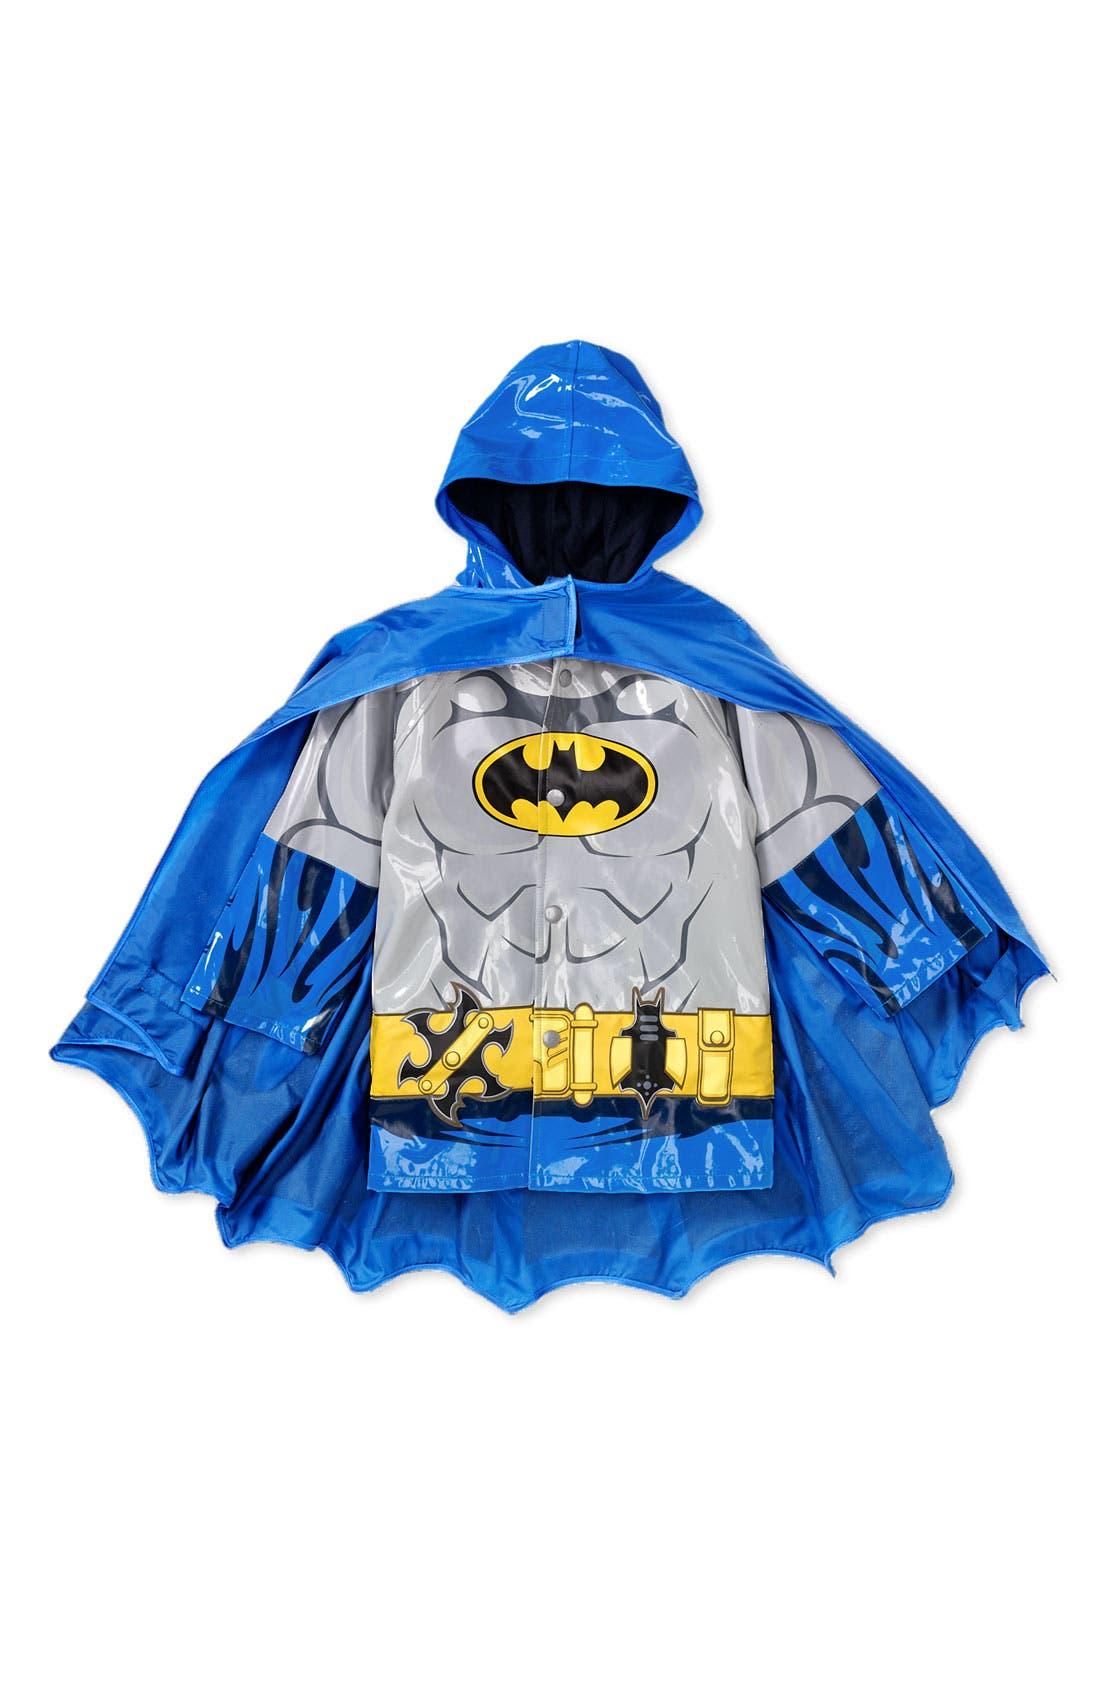 Alternate Image 1 Selected - Western Chief 'Batman' Raincoat (Toddler Boys & Little Boys)